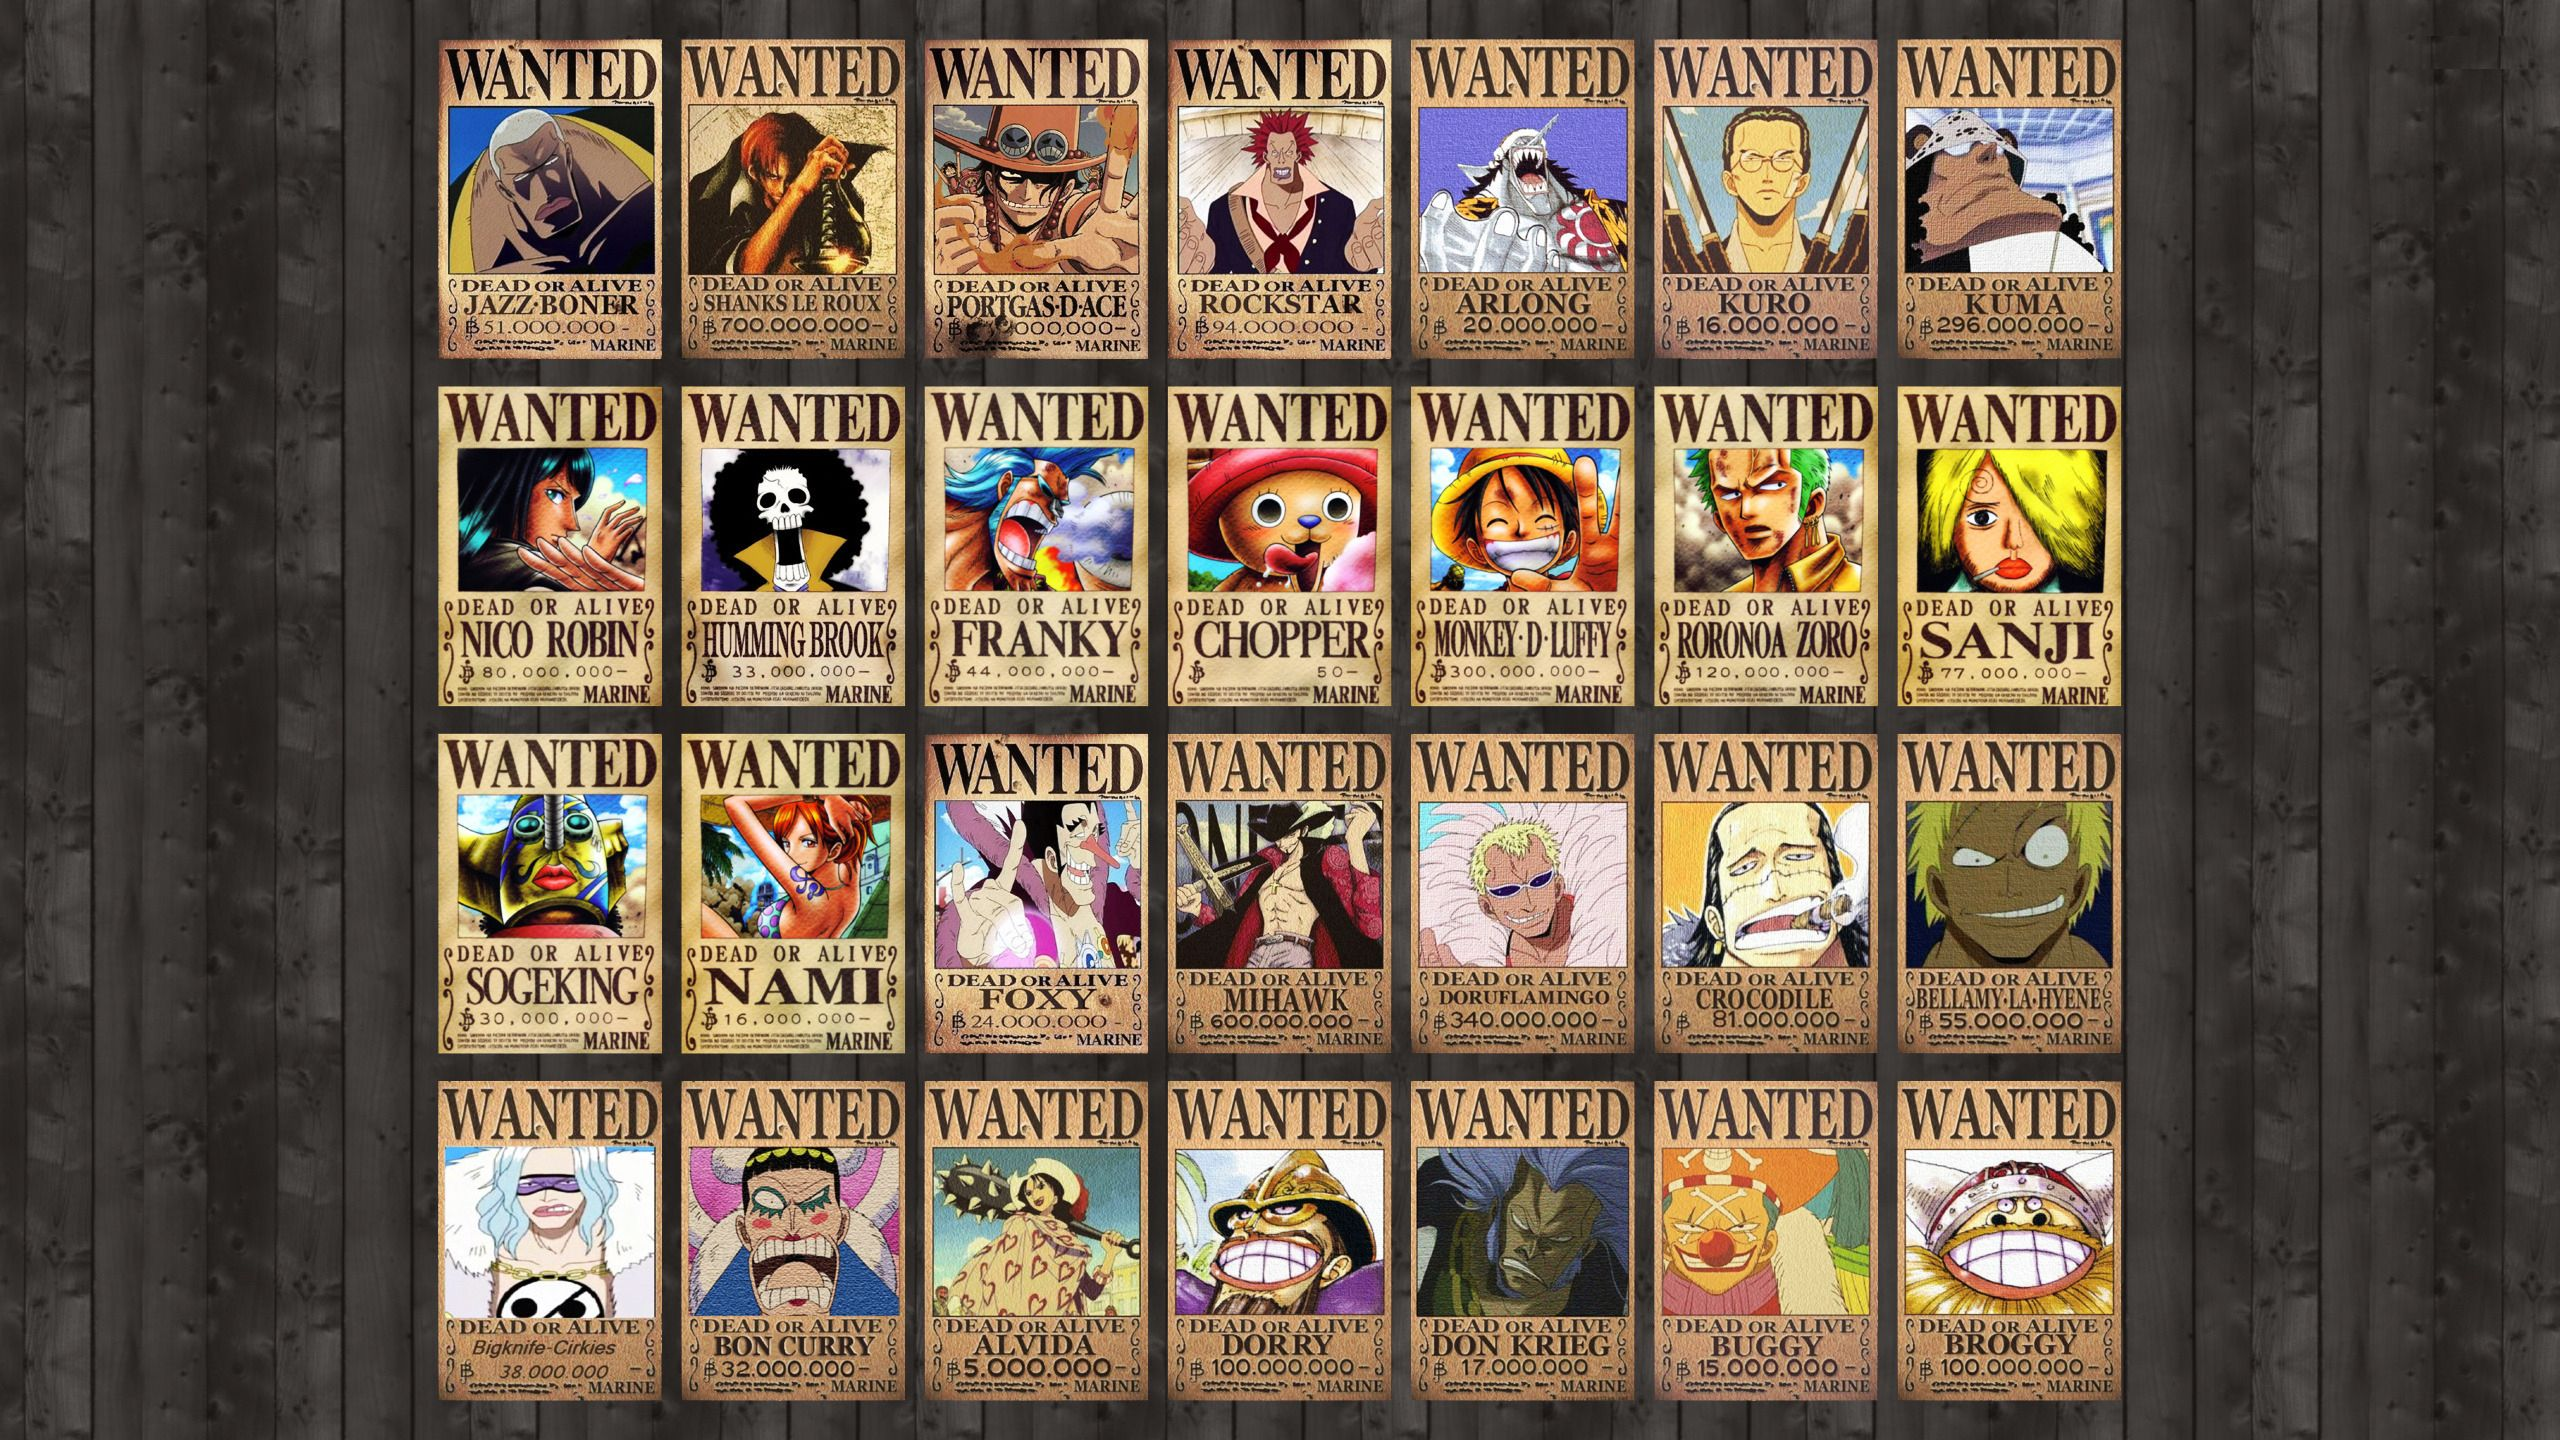 One Piece Wanted Posters Desktop WallPaper HD - http://imashon.com/w/one-piece-wanted-posters-desktop-wallpaper-hd.html